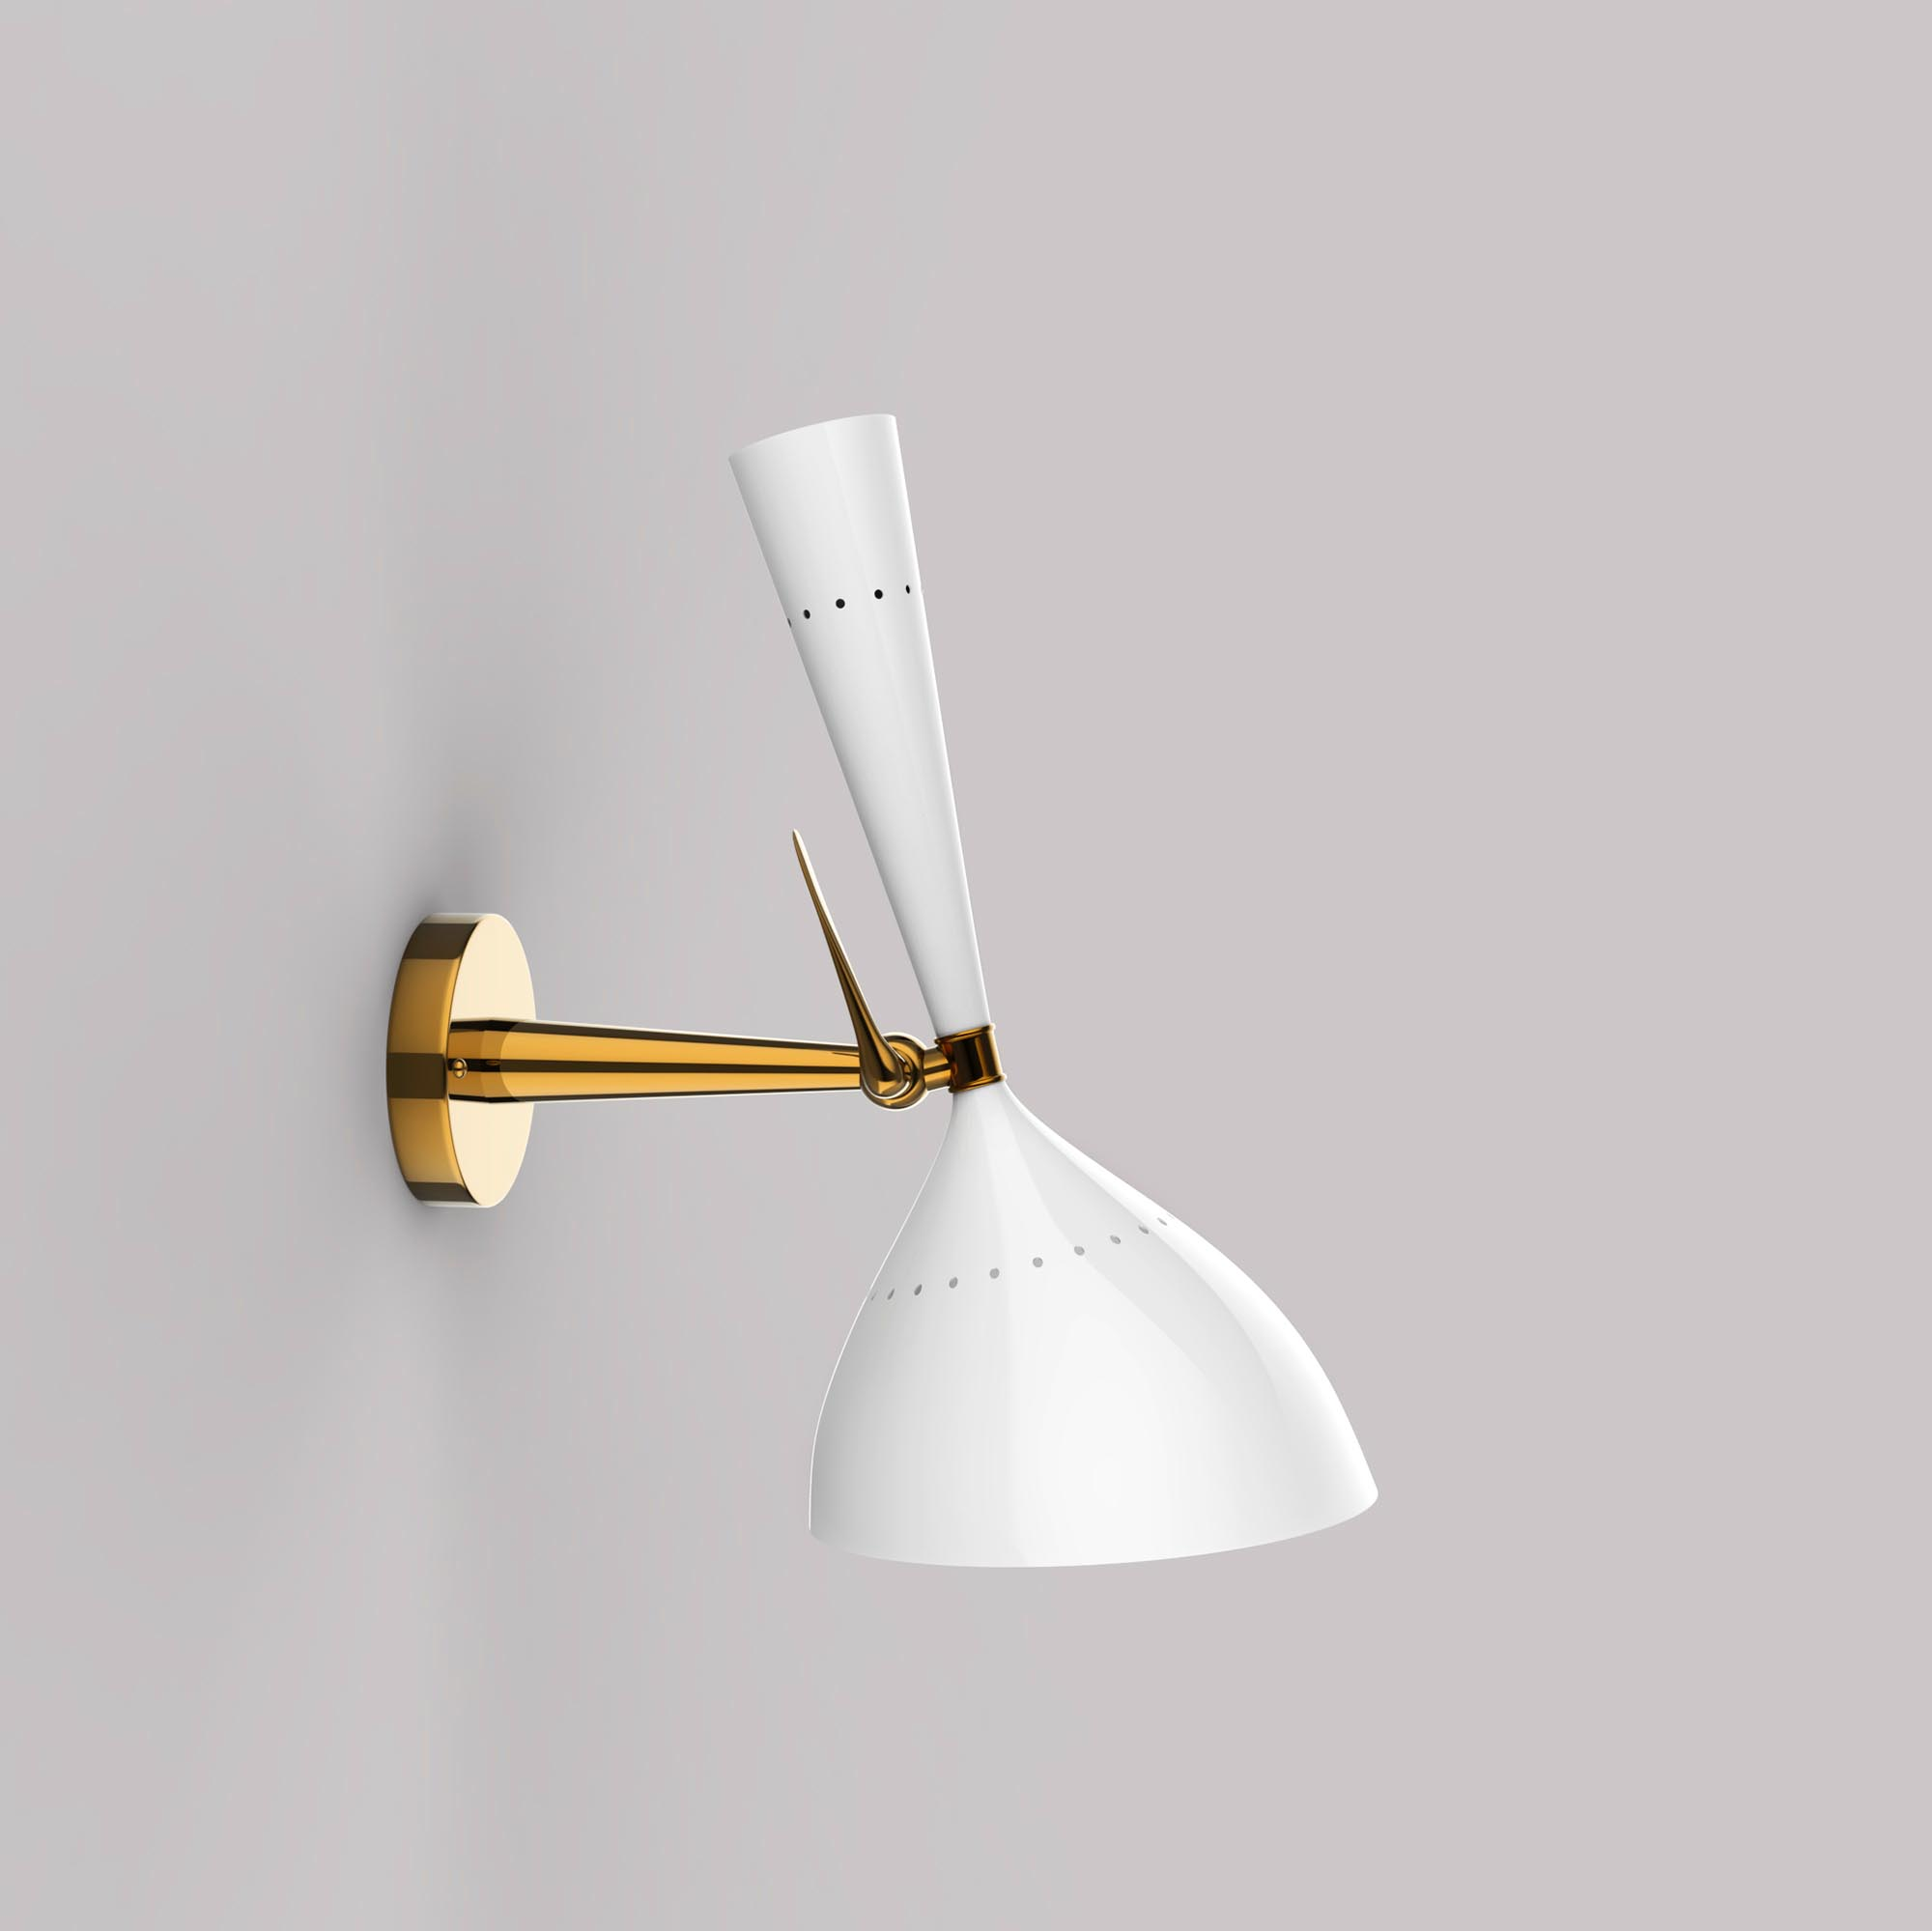 Minimalist Elegant White Wall Lamp - 3D Model